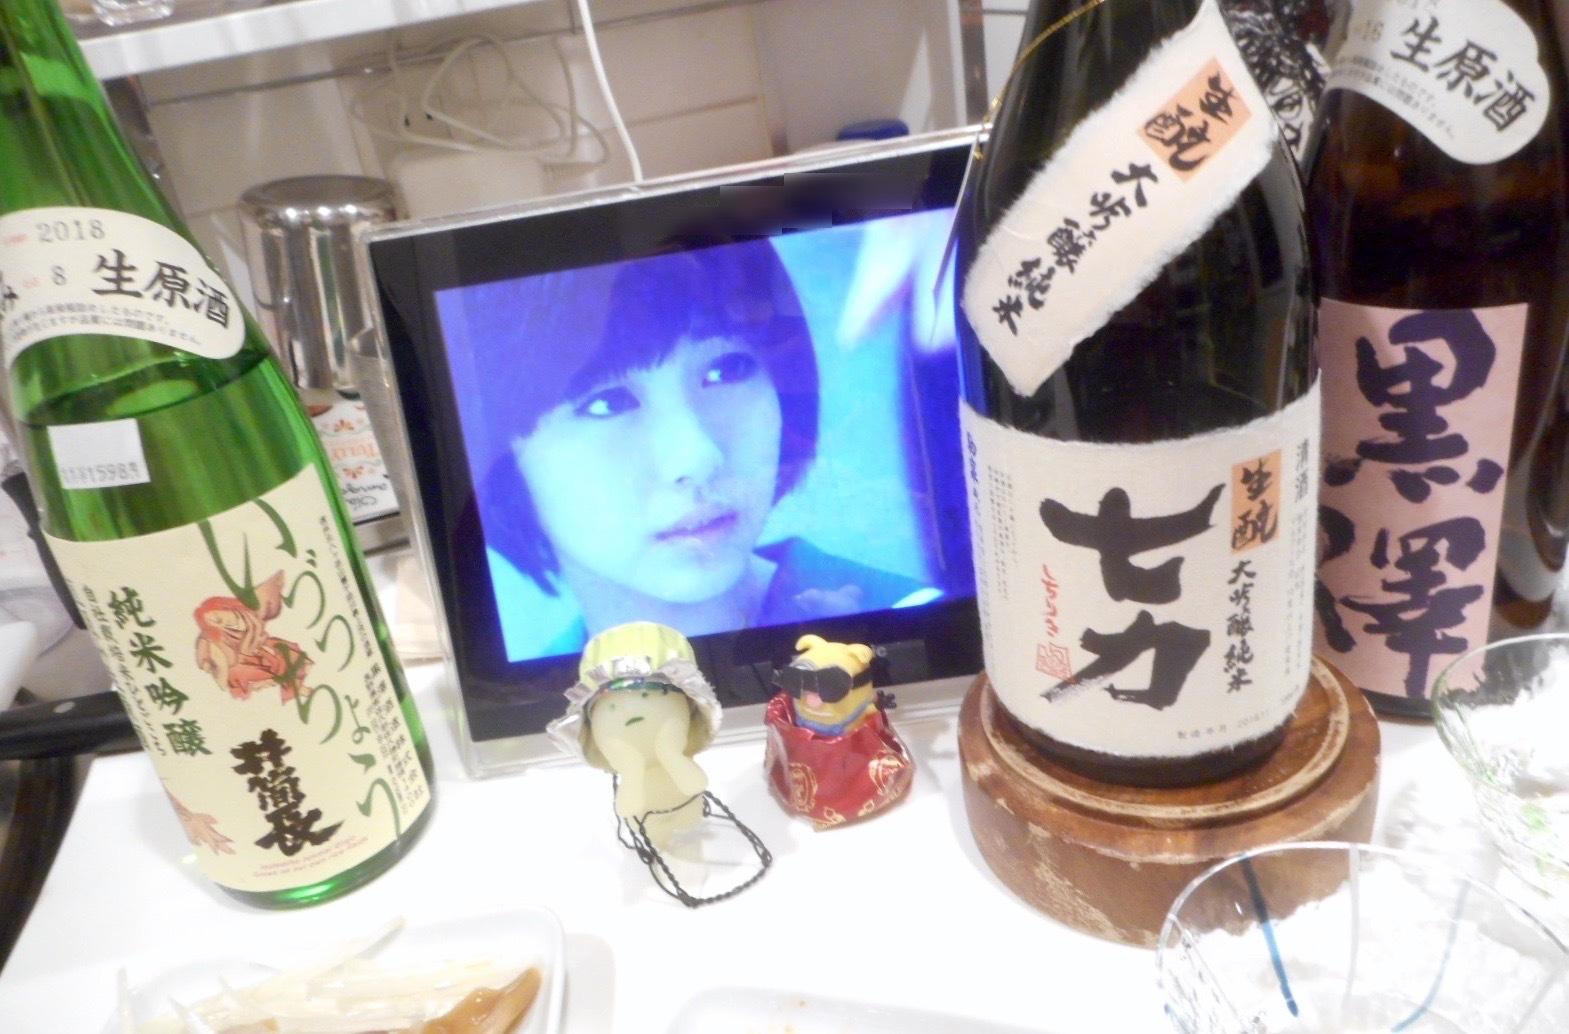 izutsuchou_jikagumi30by2_5.jpg